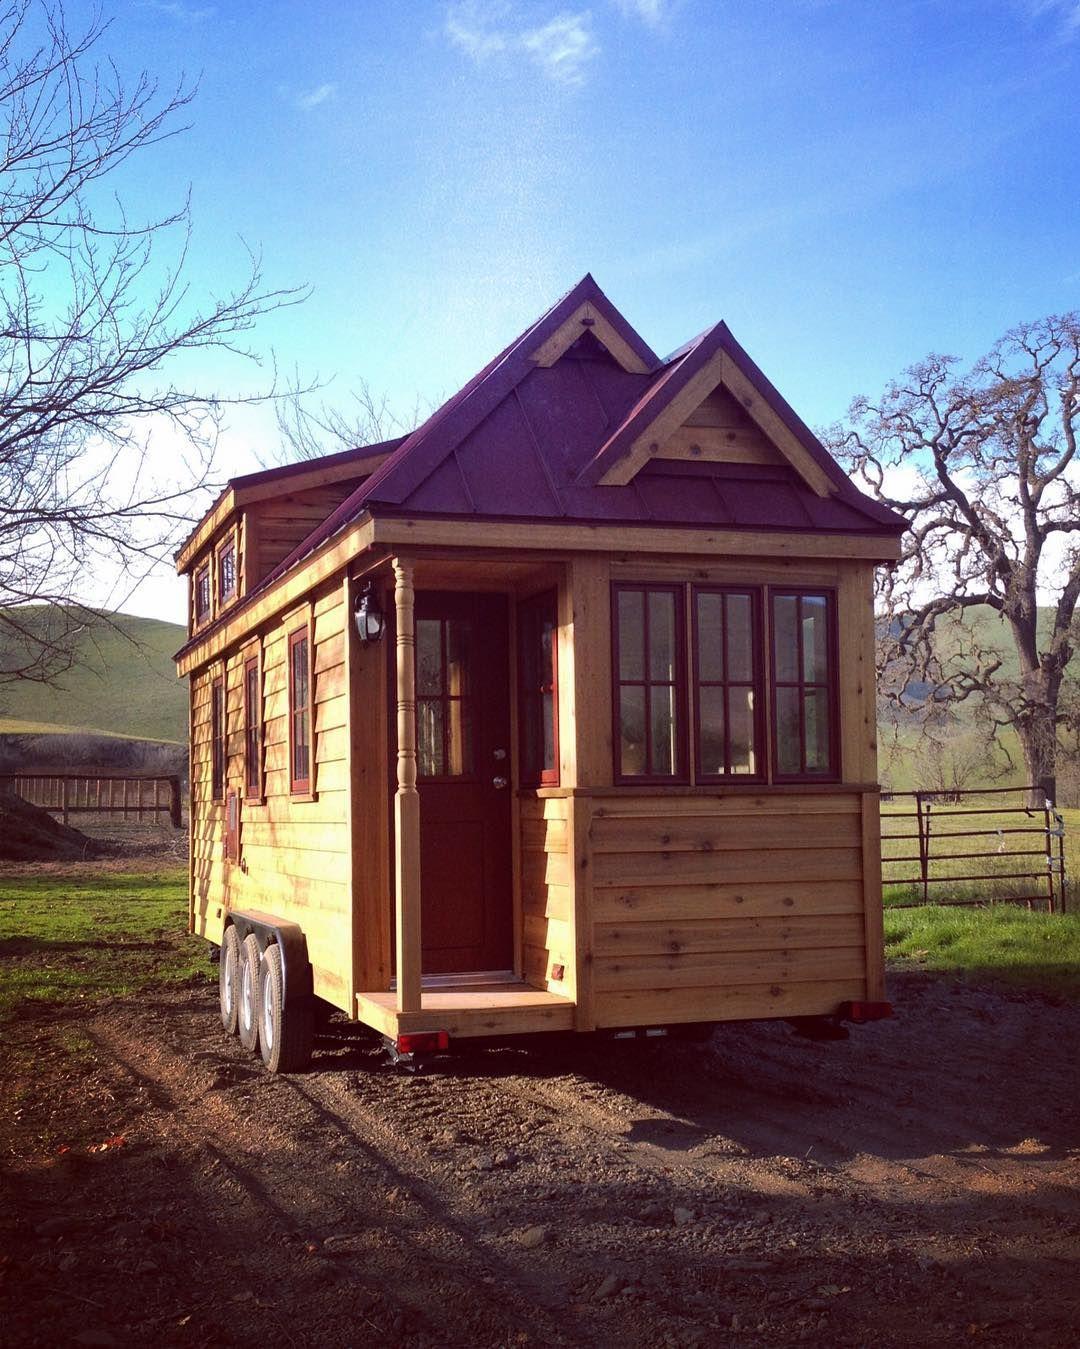 First day on the farm..... #tinyhome #tinyhouse #tiny #tinyhouseonwheels #tinyhousemovement #tinyliving #tinyhousedesign #cabinporn #cabin #architecture #tumbleweed #tumbleweedtinyhouse #home #farm #farmlife #postitfortheaesthetic #aquietstyle #nestandflourish #astilllifestyle #seekthesimplicity #lightandairy #pursuepretty #handmadehomegoods #kinfolkhome #apartmenttherapy #minimalist #housegoals #hgtv #gotiny